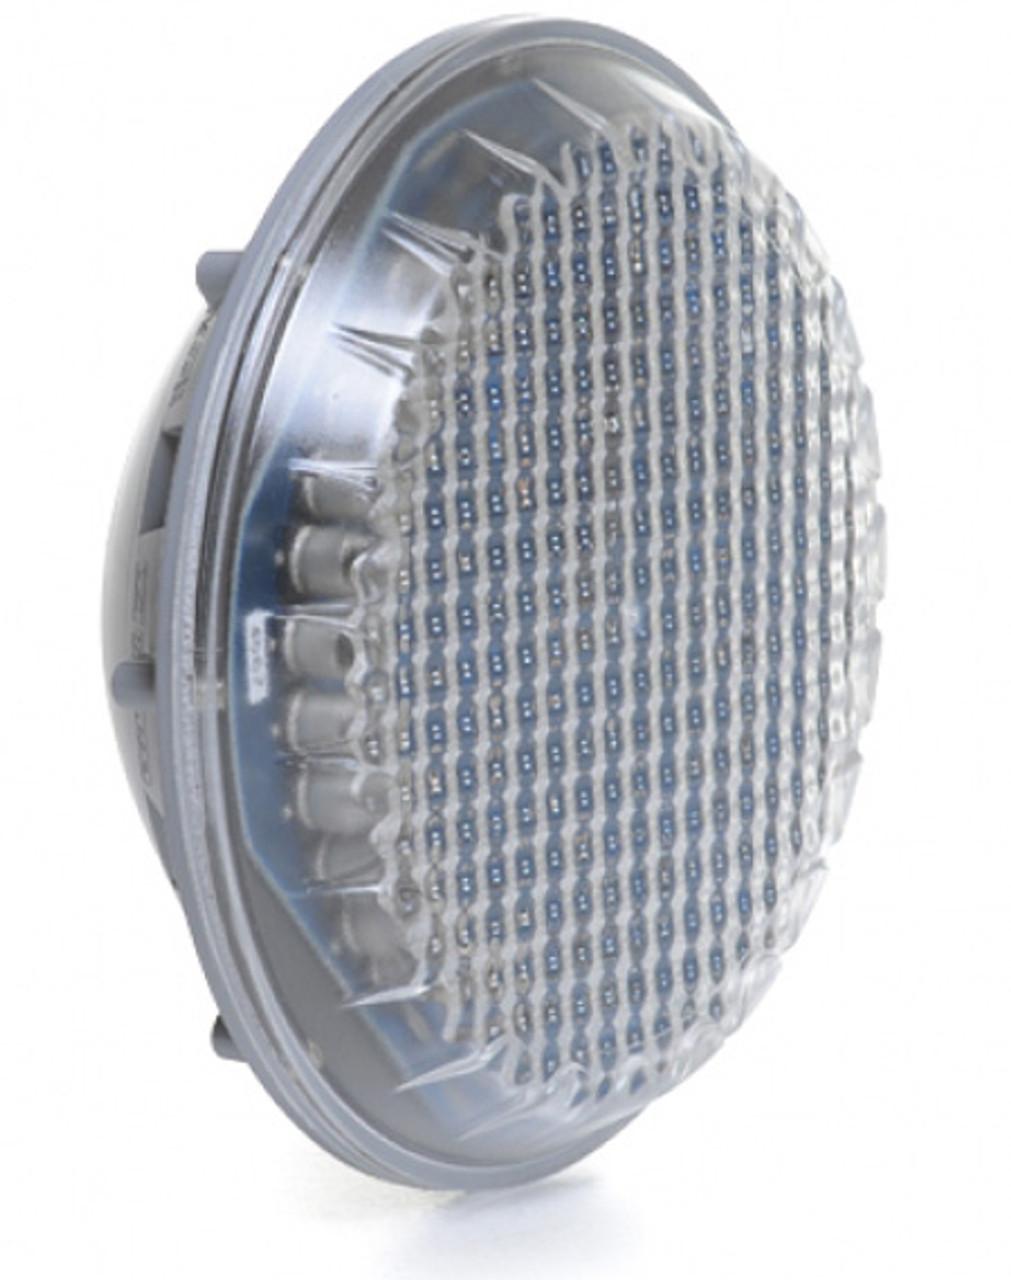 Certikin LT White LED Replacement Bulb PLQW0800